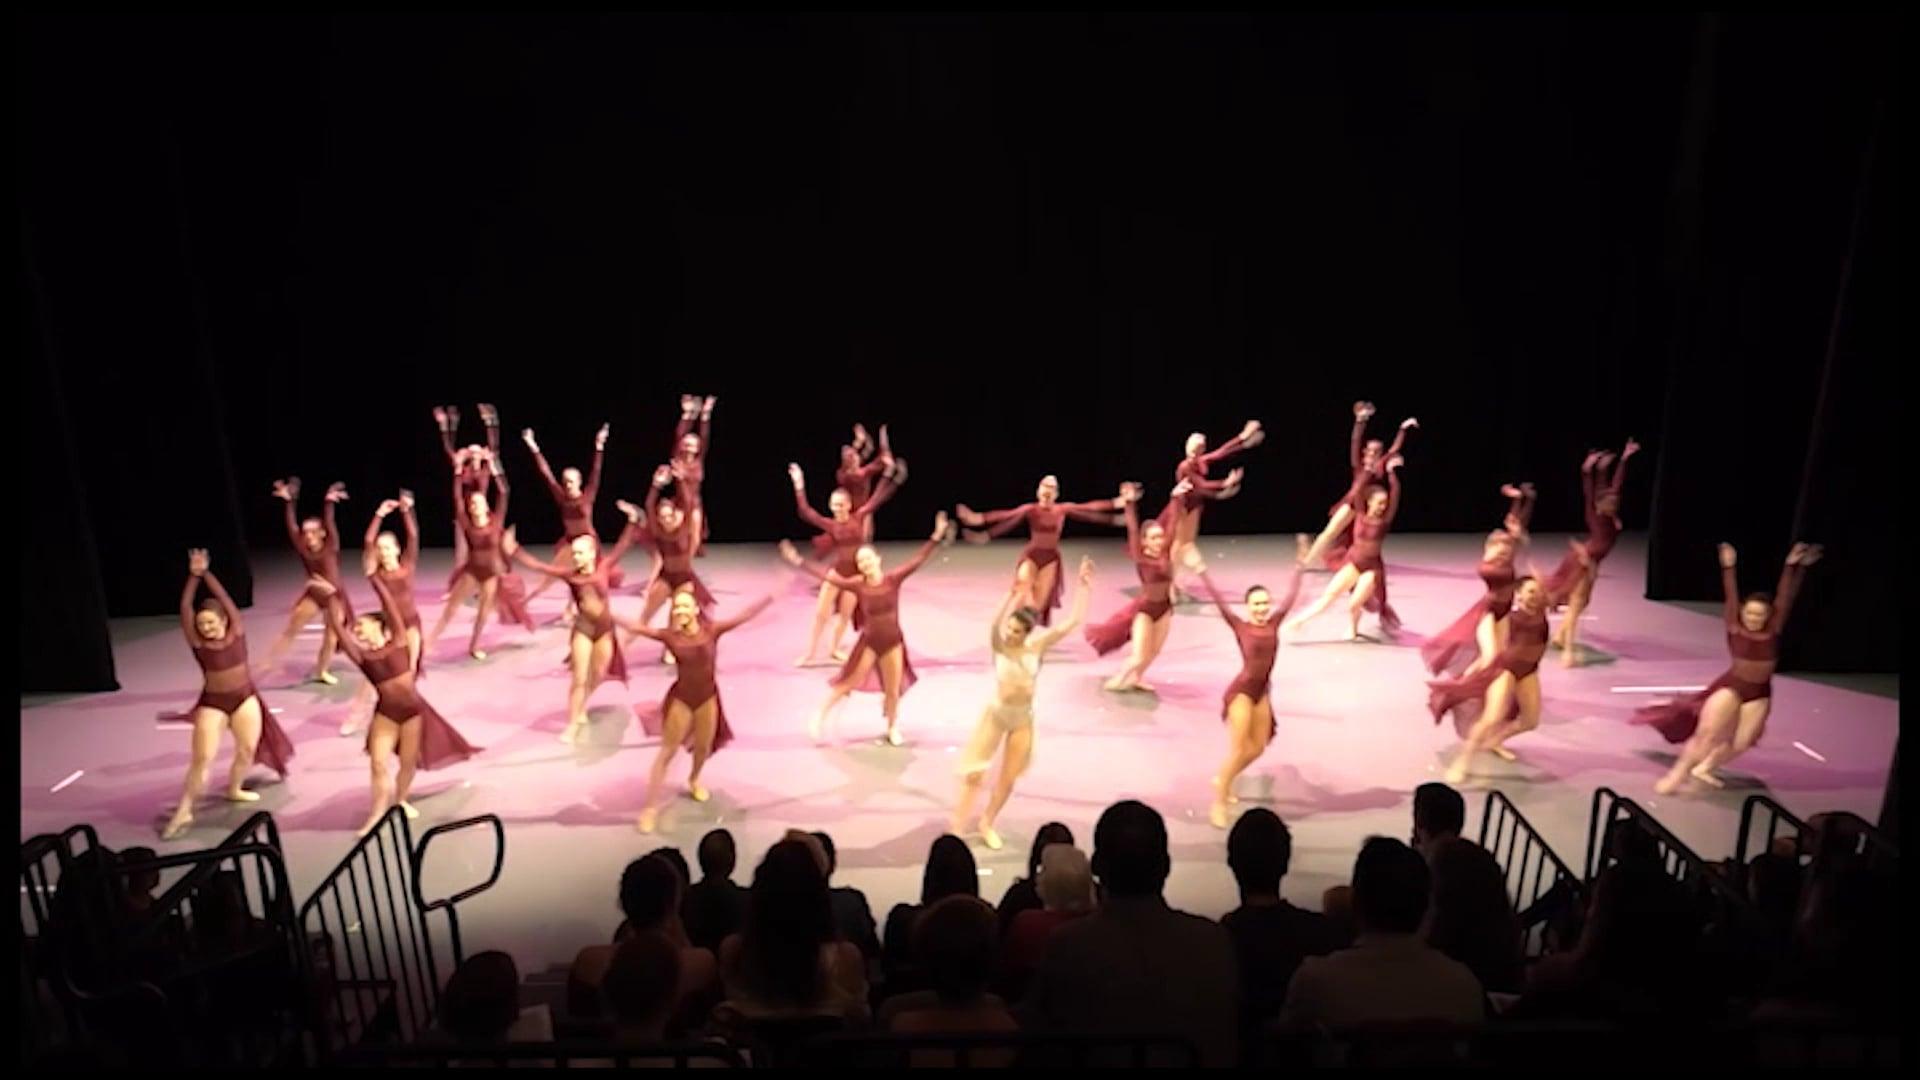 Tobin James Choreography